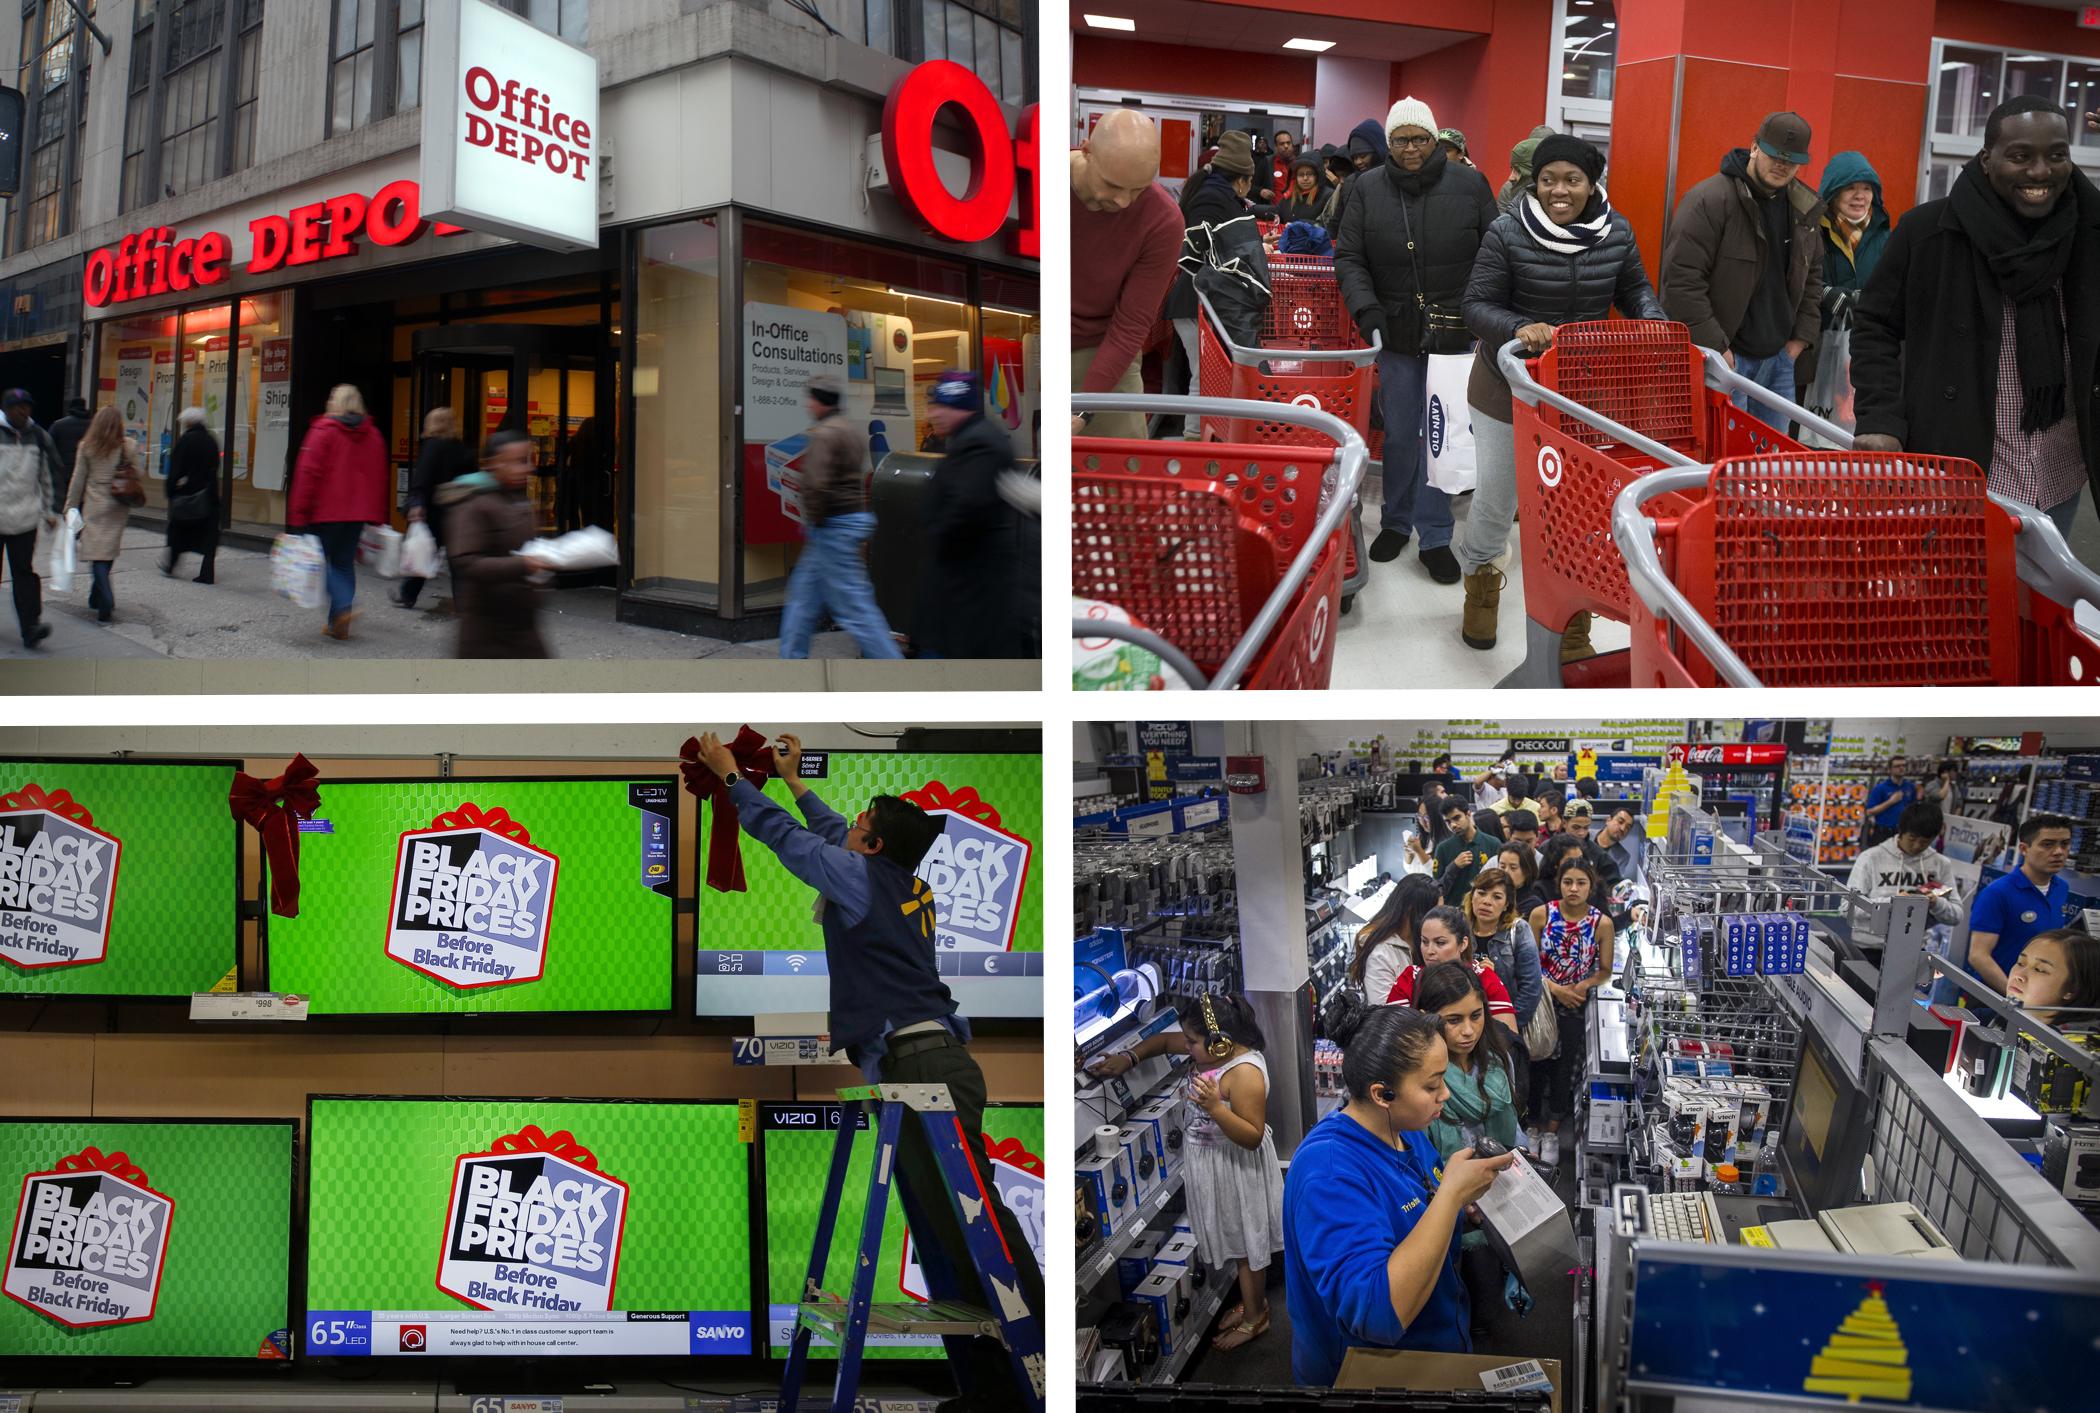 Black Friday 2015 The Best Black Friday Deals Sales Money